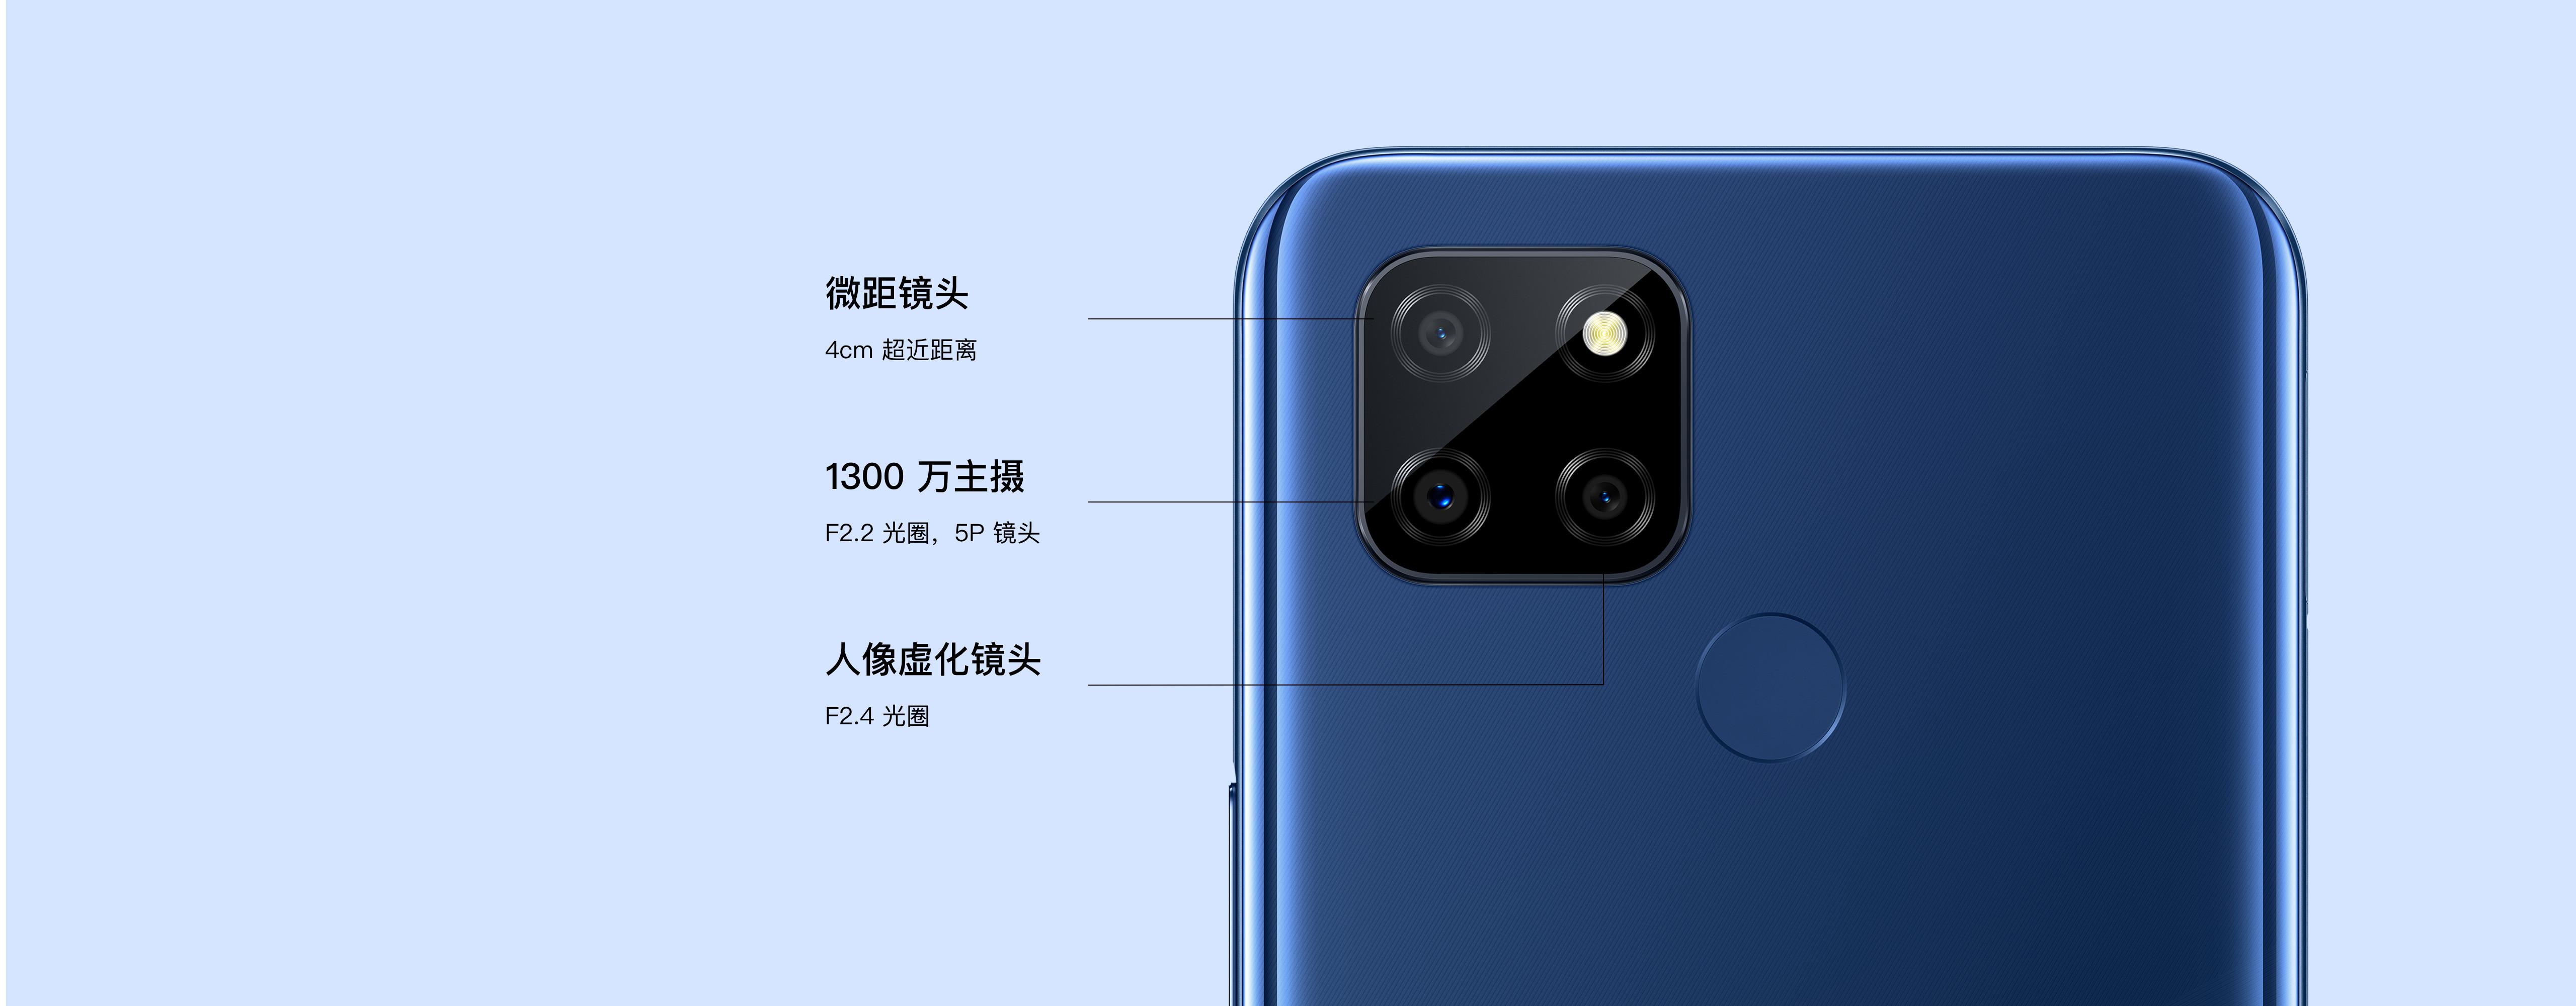 Realme V3 5G